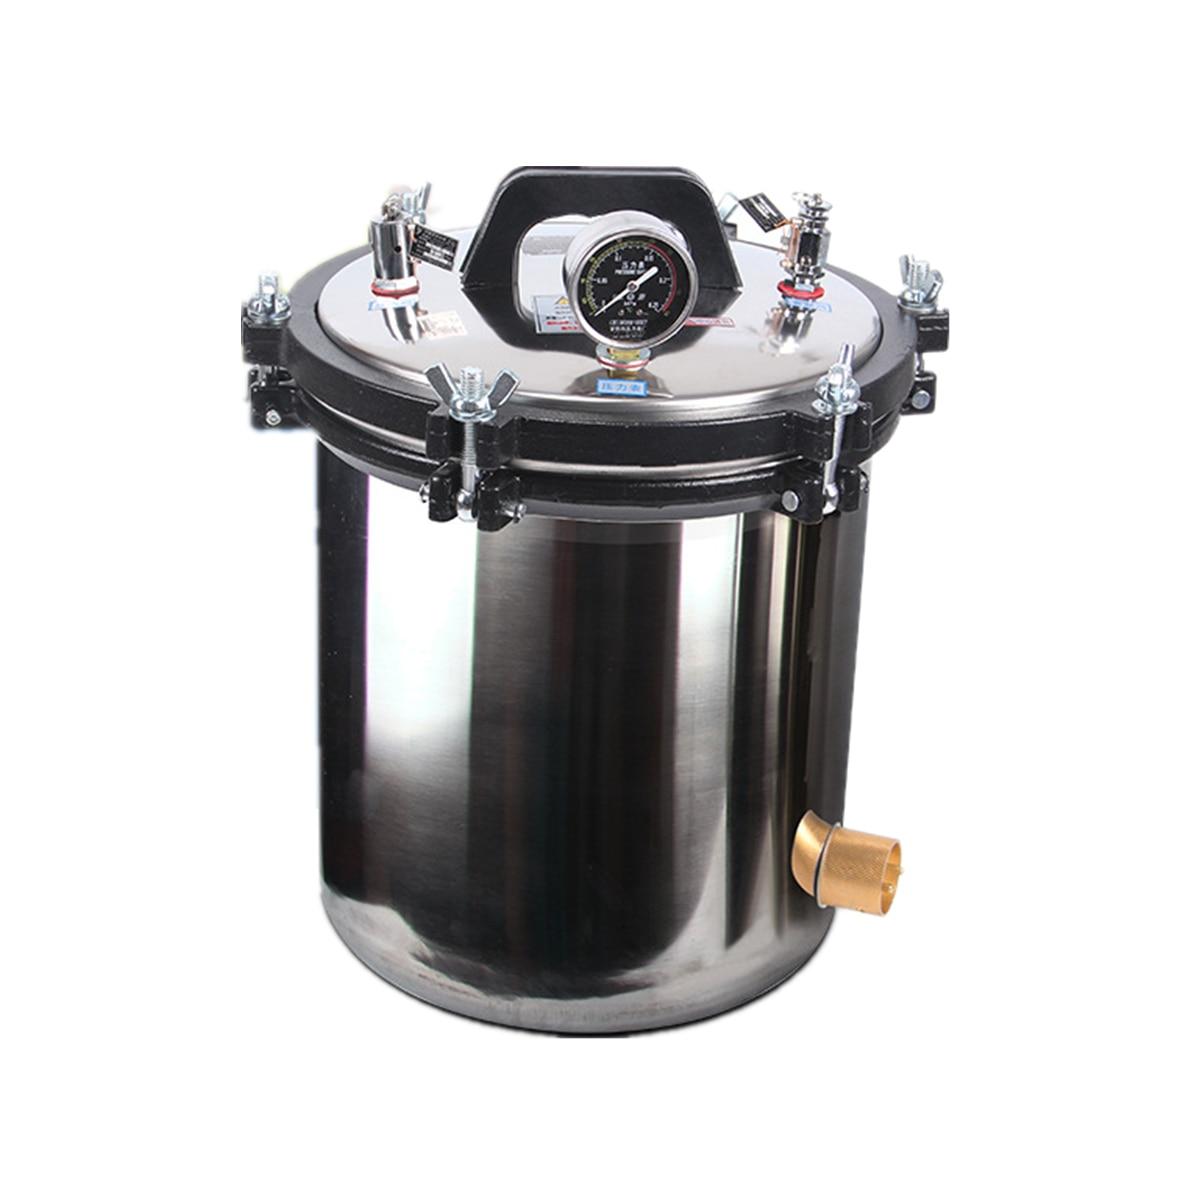 Us 16416 43 Offstainless High Pressure Steam Sterilizer Medical Dental Tattoo Autoclave Sterilization Heavy Cast Aluminum Pressure Cooker 8l In